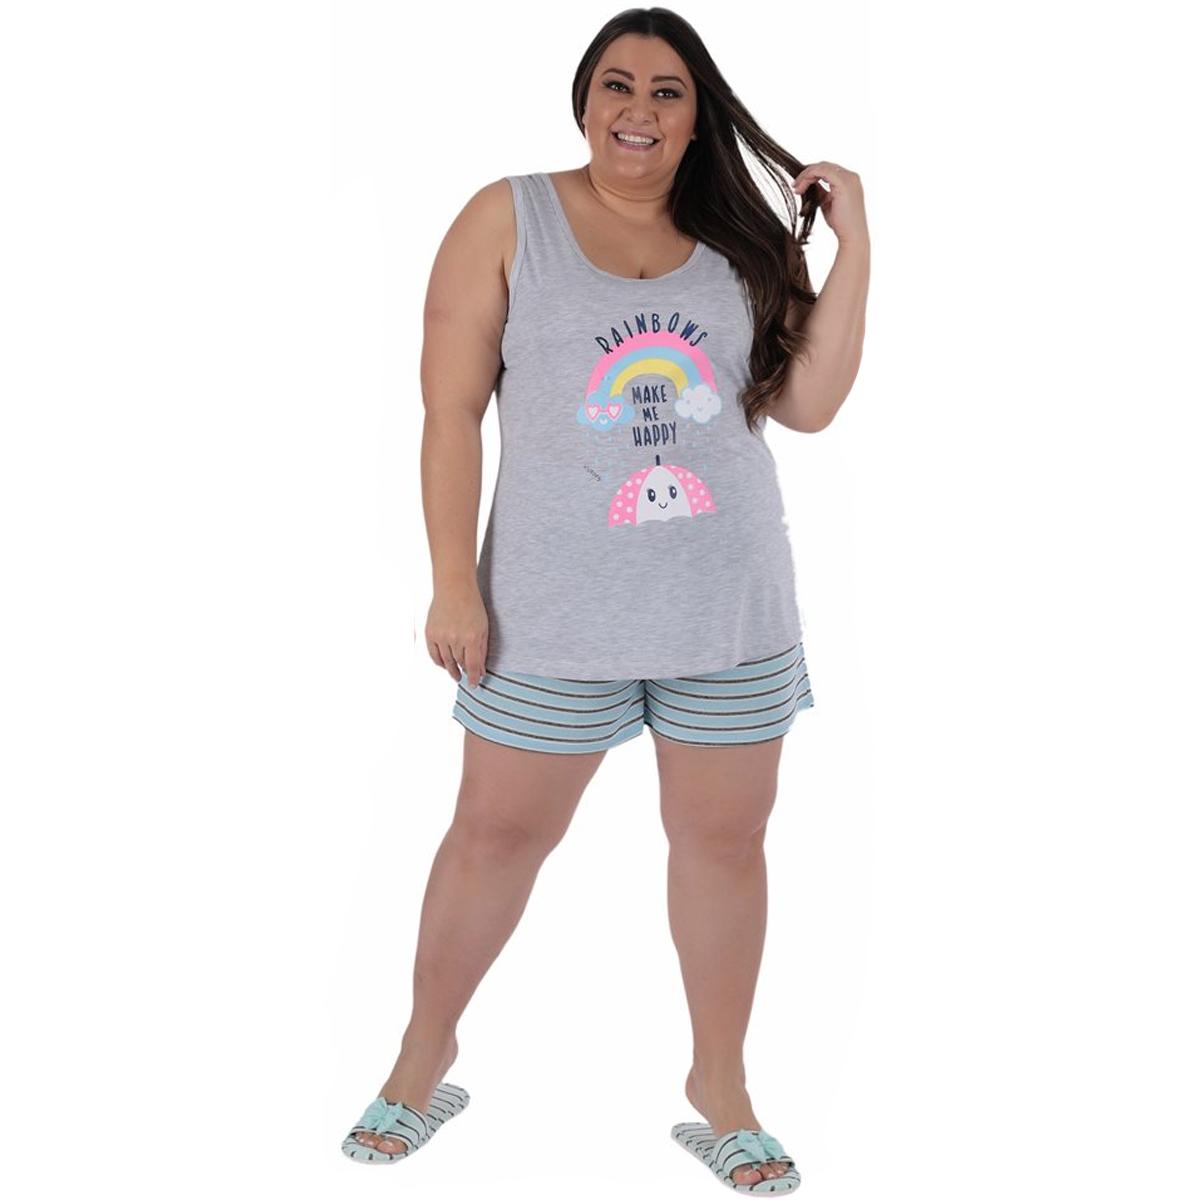 Pijama plus size verão short doll regata feminino Victory